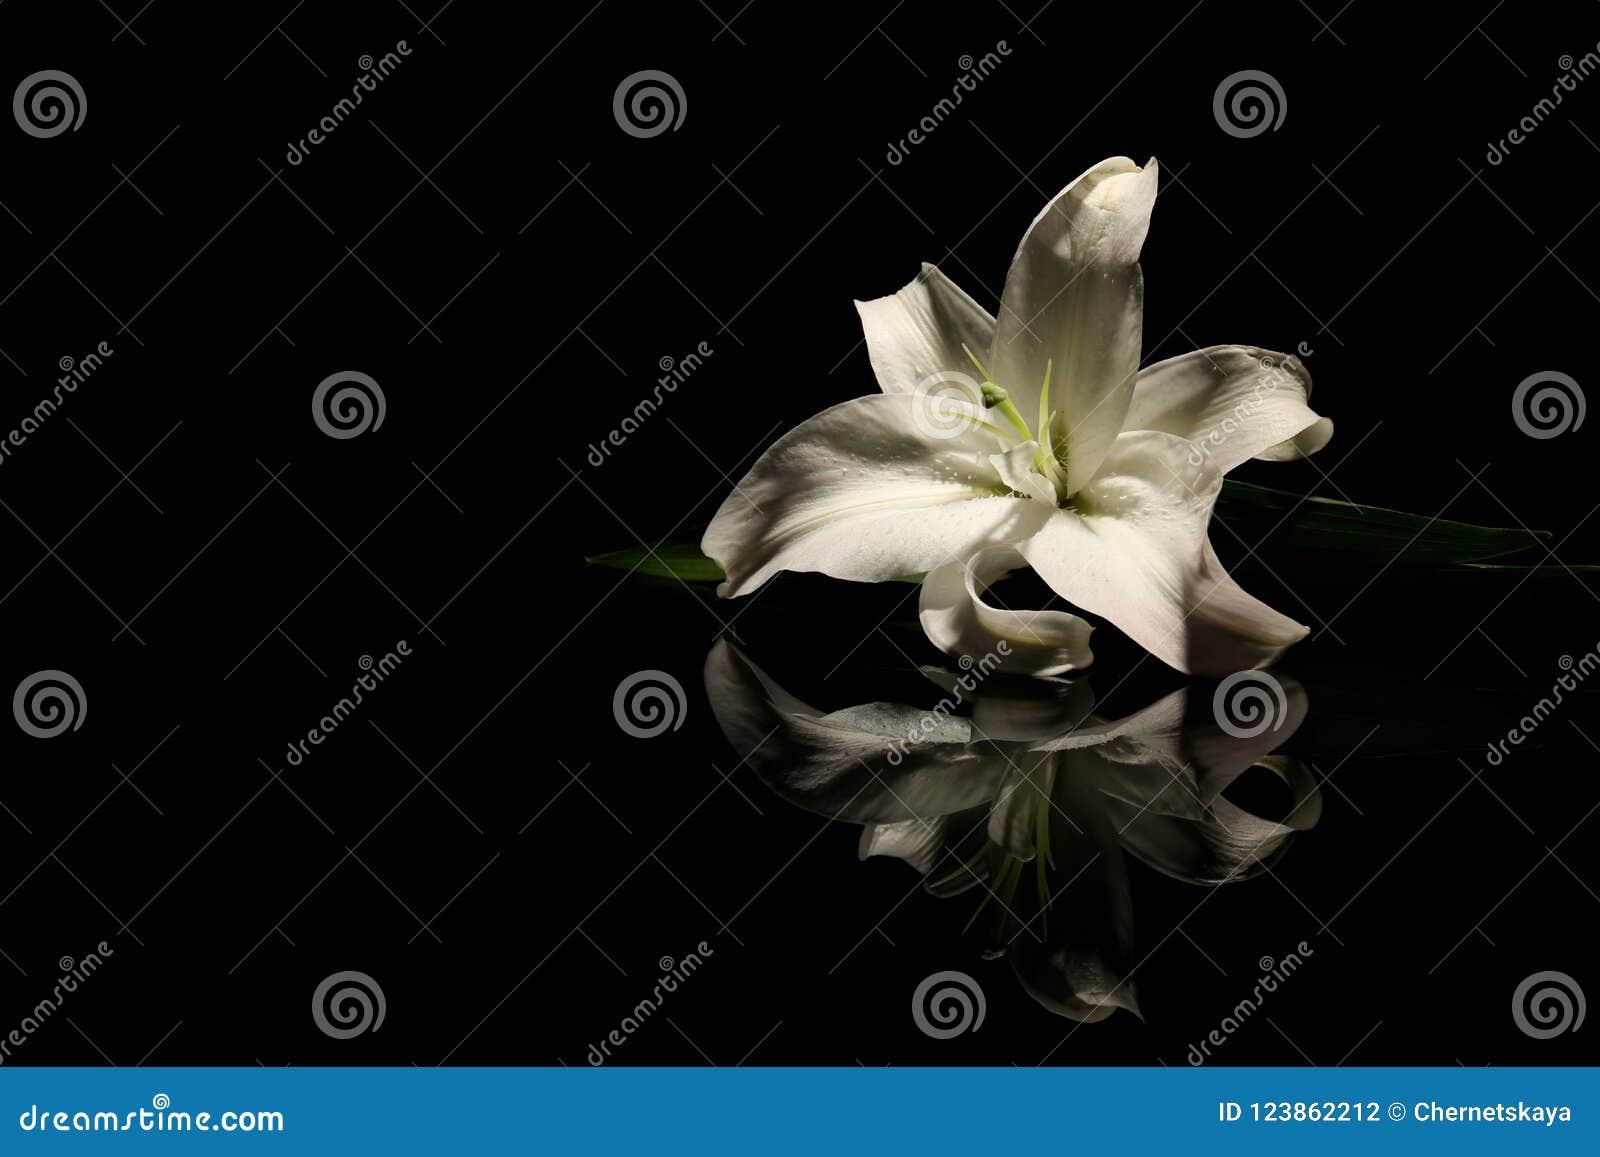 Beautiful lily on dark background with spac stock photo image of download beautiful lily on dark background with spac stock photo image of death christian izmirmasajfo